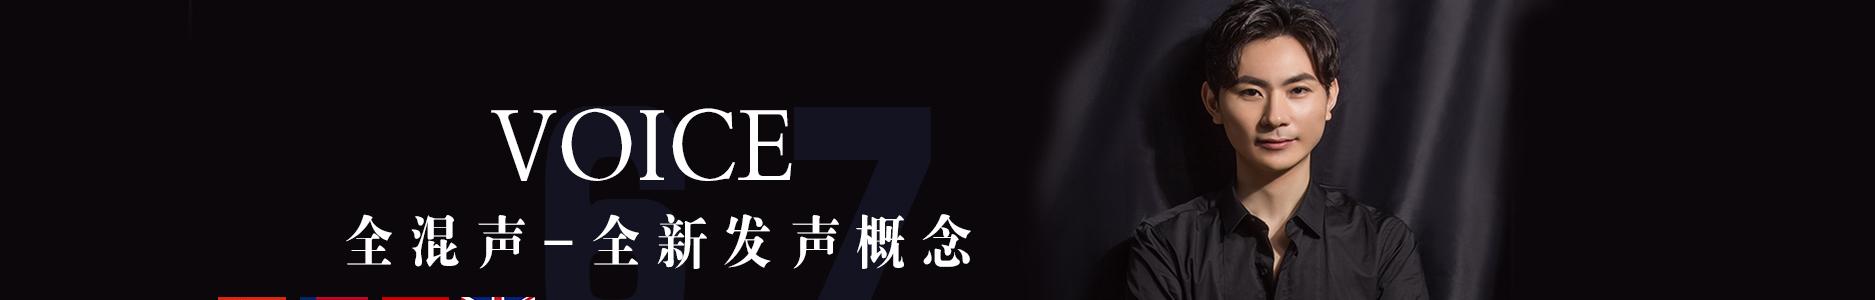 伍文彬解密明星唱法 banner